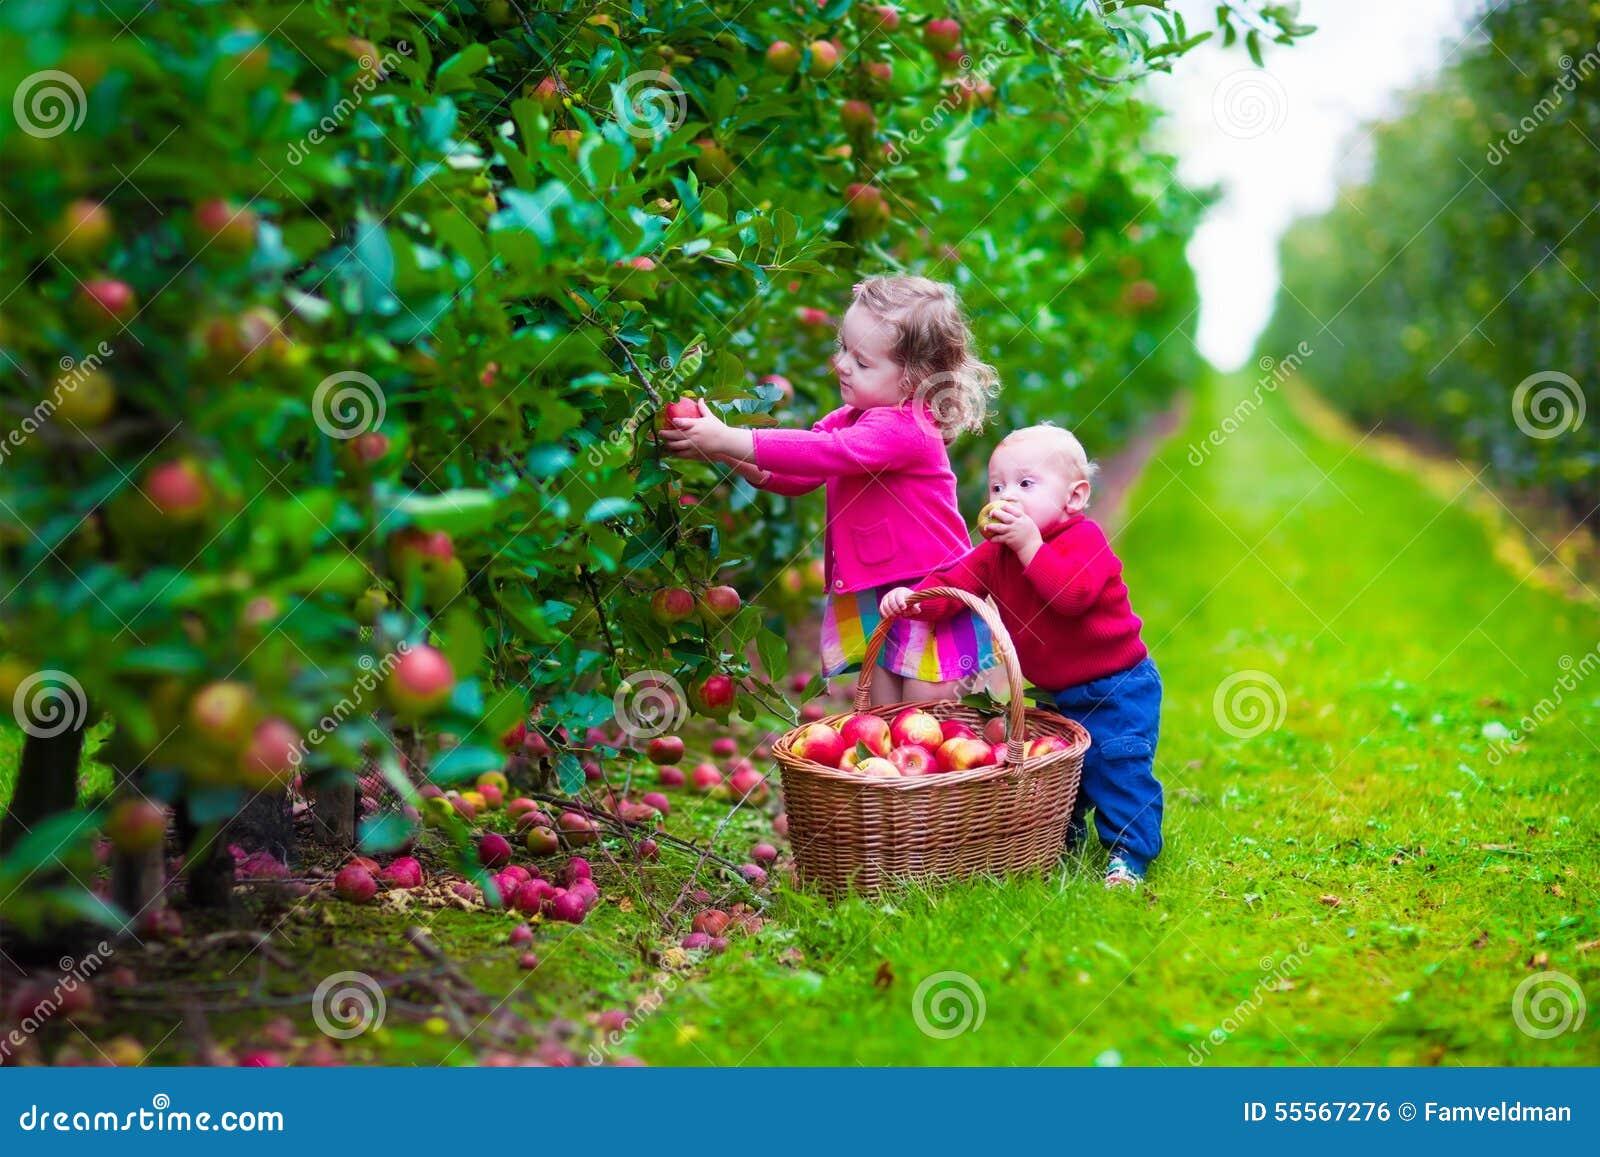 Kids picking fresh apple on a farm